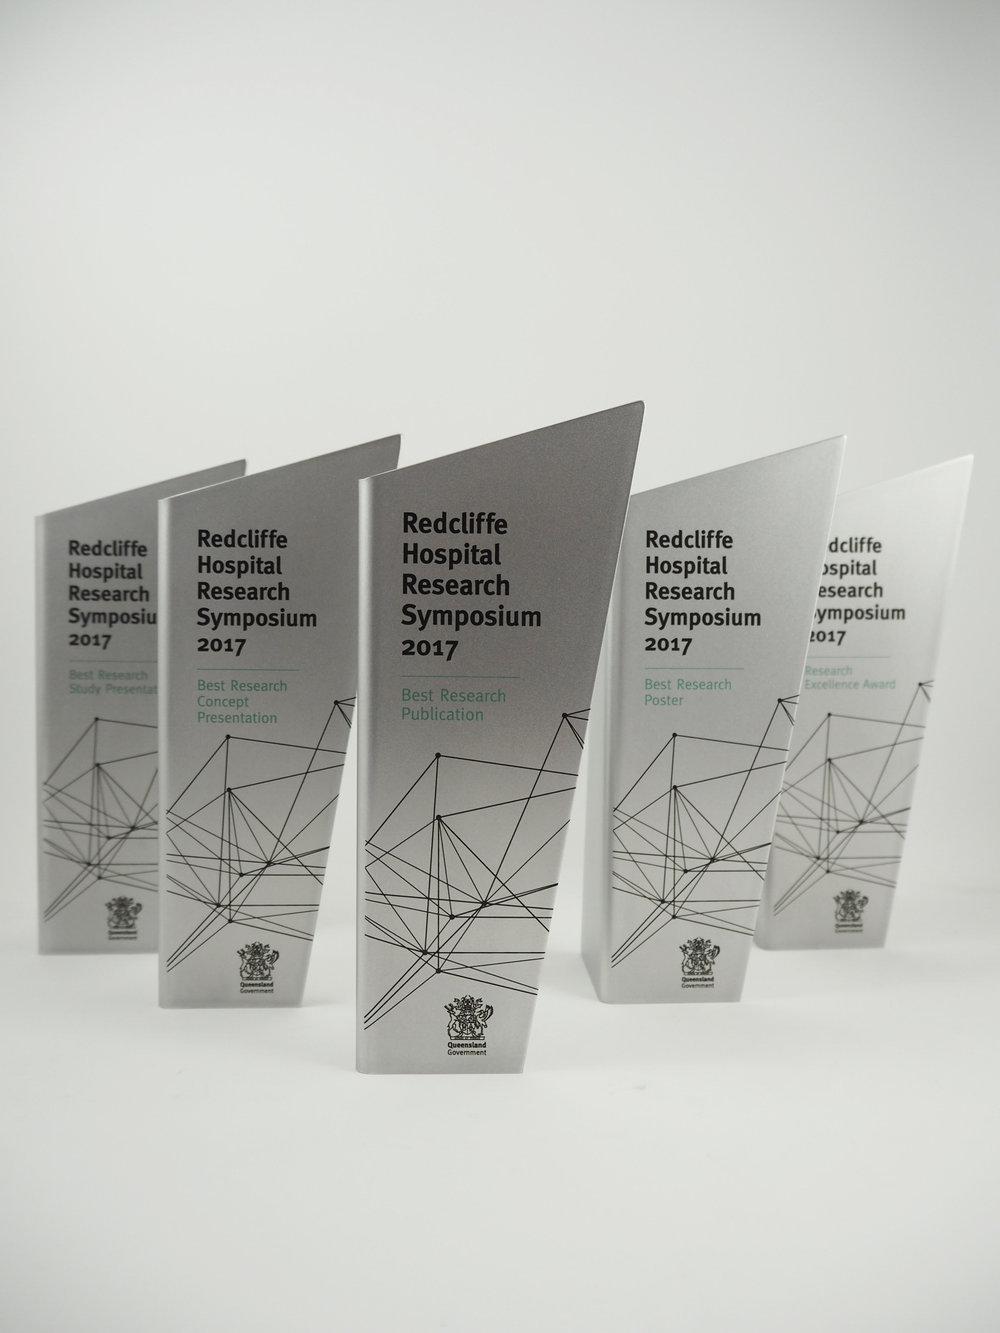 Redcliffe-Hospital-Symposium-eco-aluminium-trophy-award-03.jpg